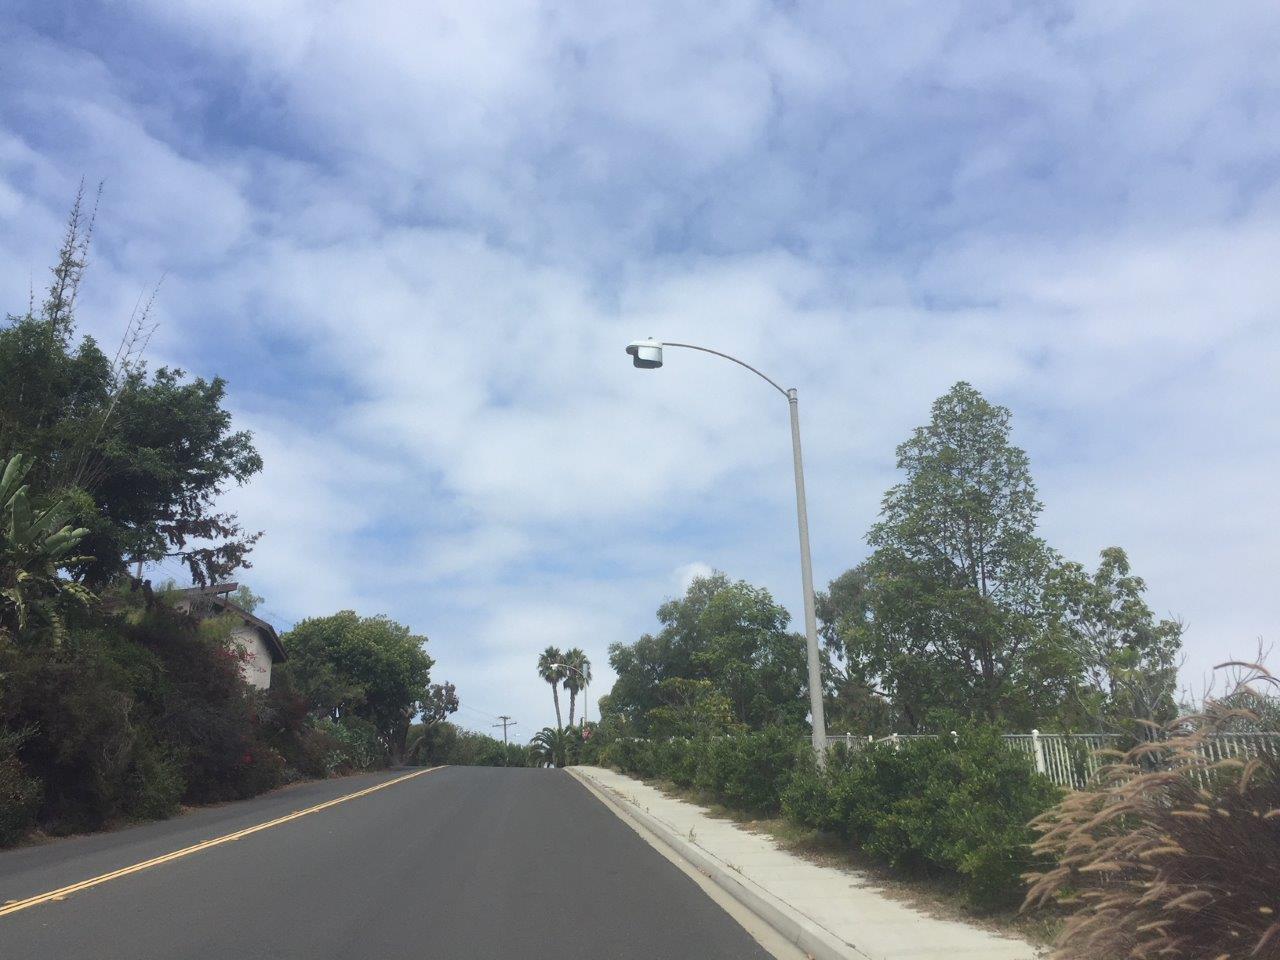 Light Shields Explained Outdoor Parking Lot Light Shielding